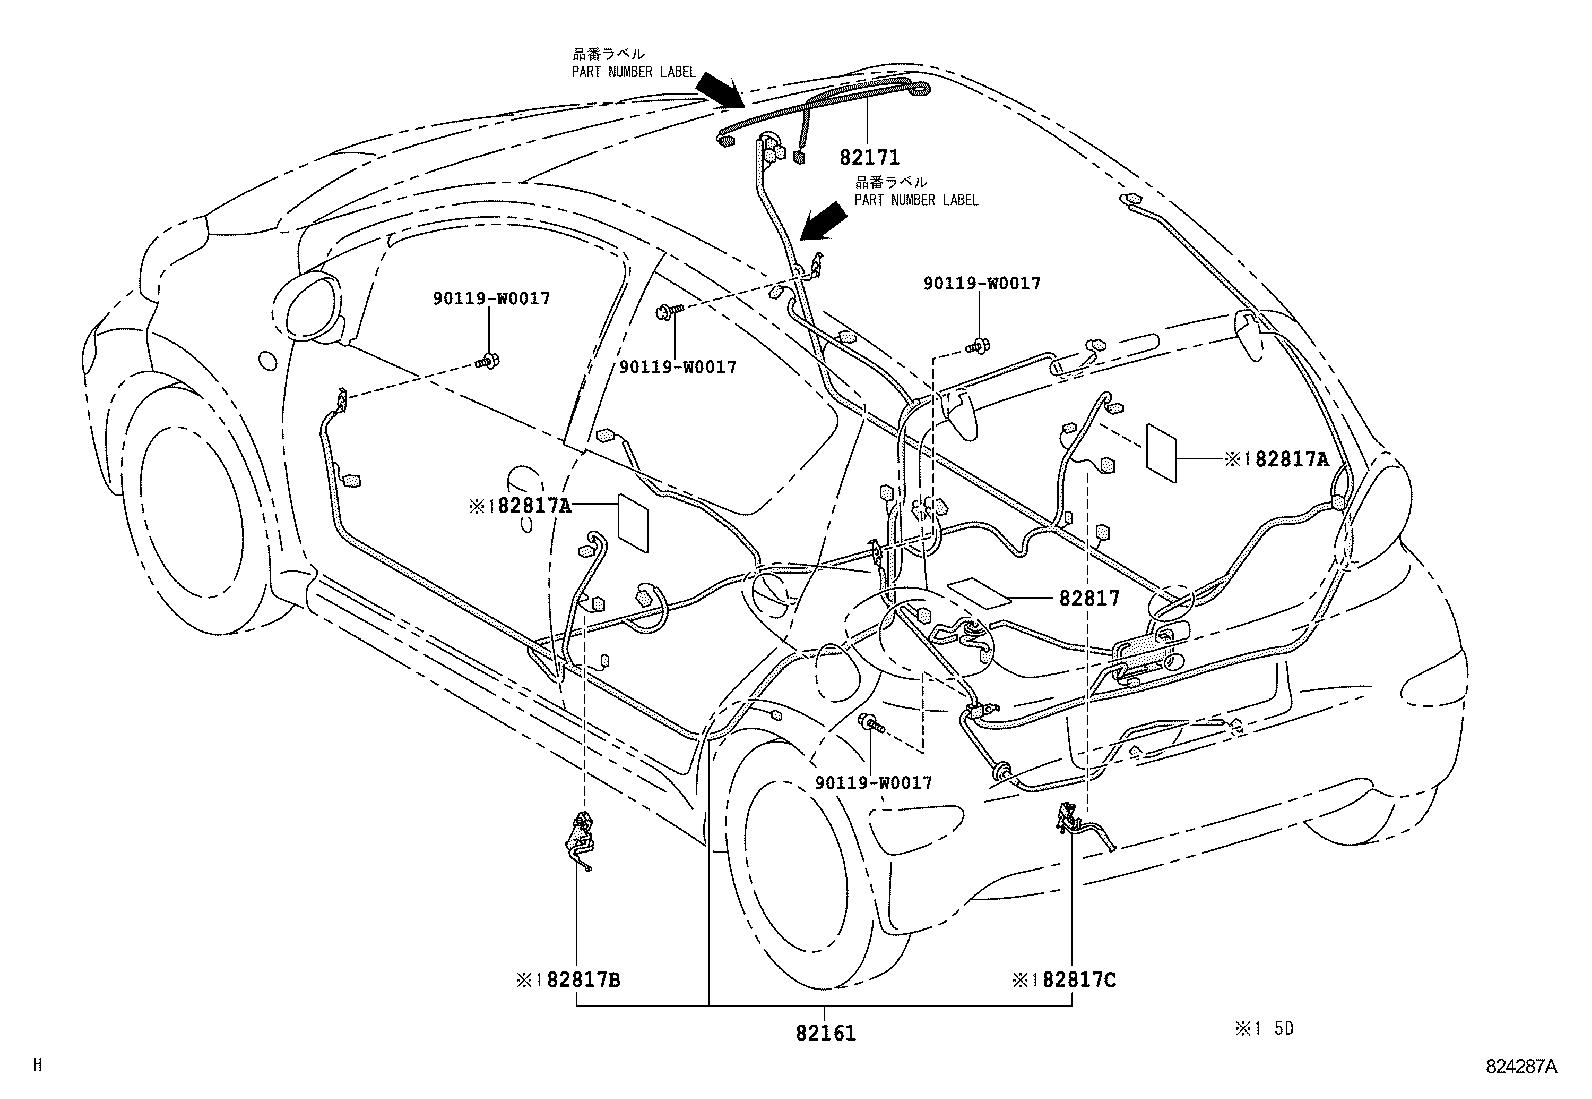 Wiring Diagram Toyota Aygo